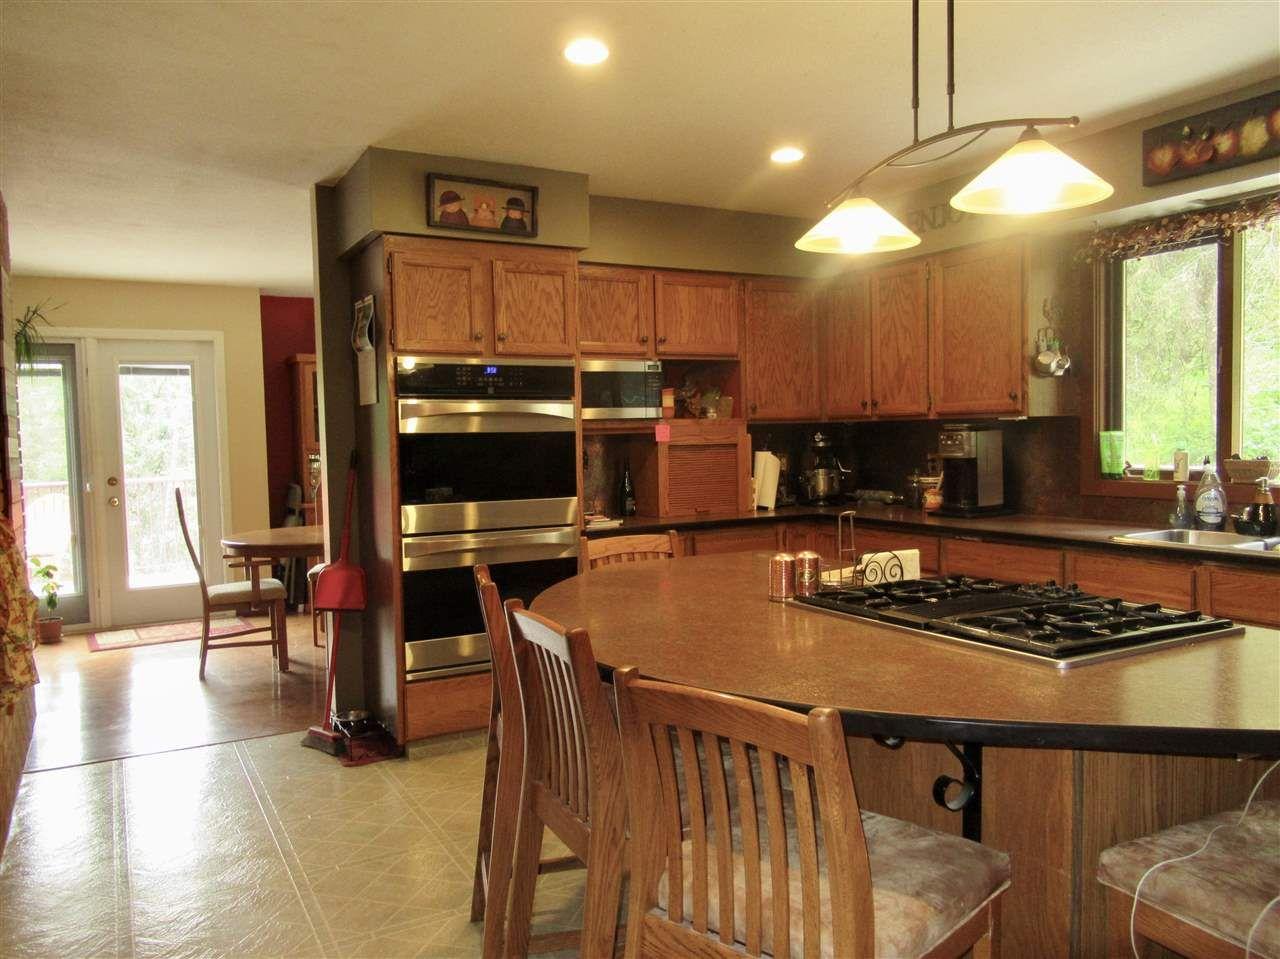 Photo 4: Photos: 911 CENTAUR Drive in Williams Lake: Esler/Dog Creek House for sale (Williams Lake (Zone 27))  : MLS®# R2378444